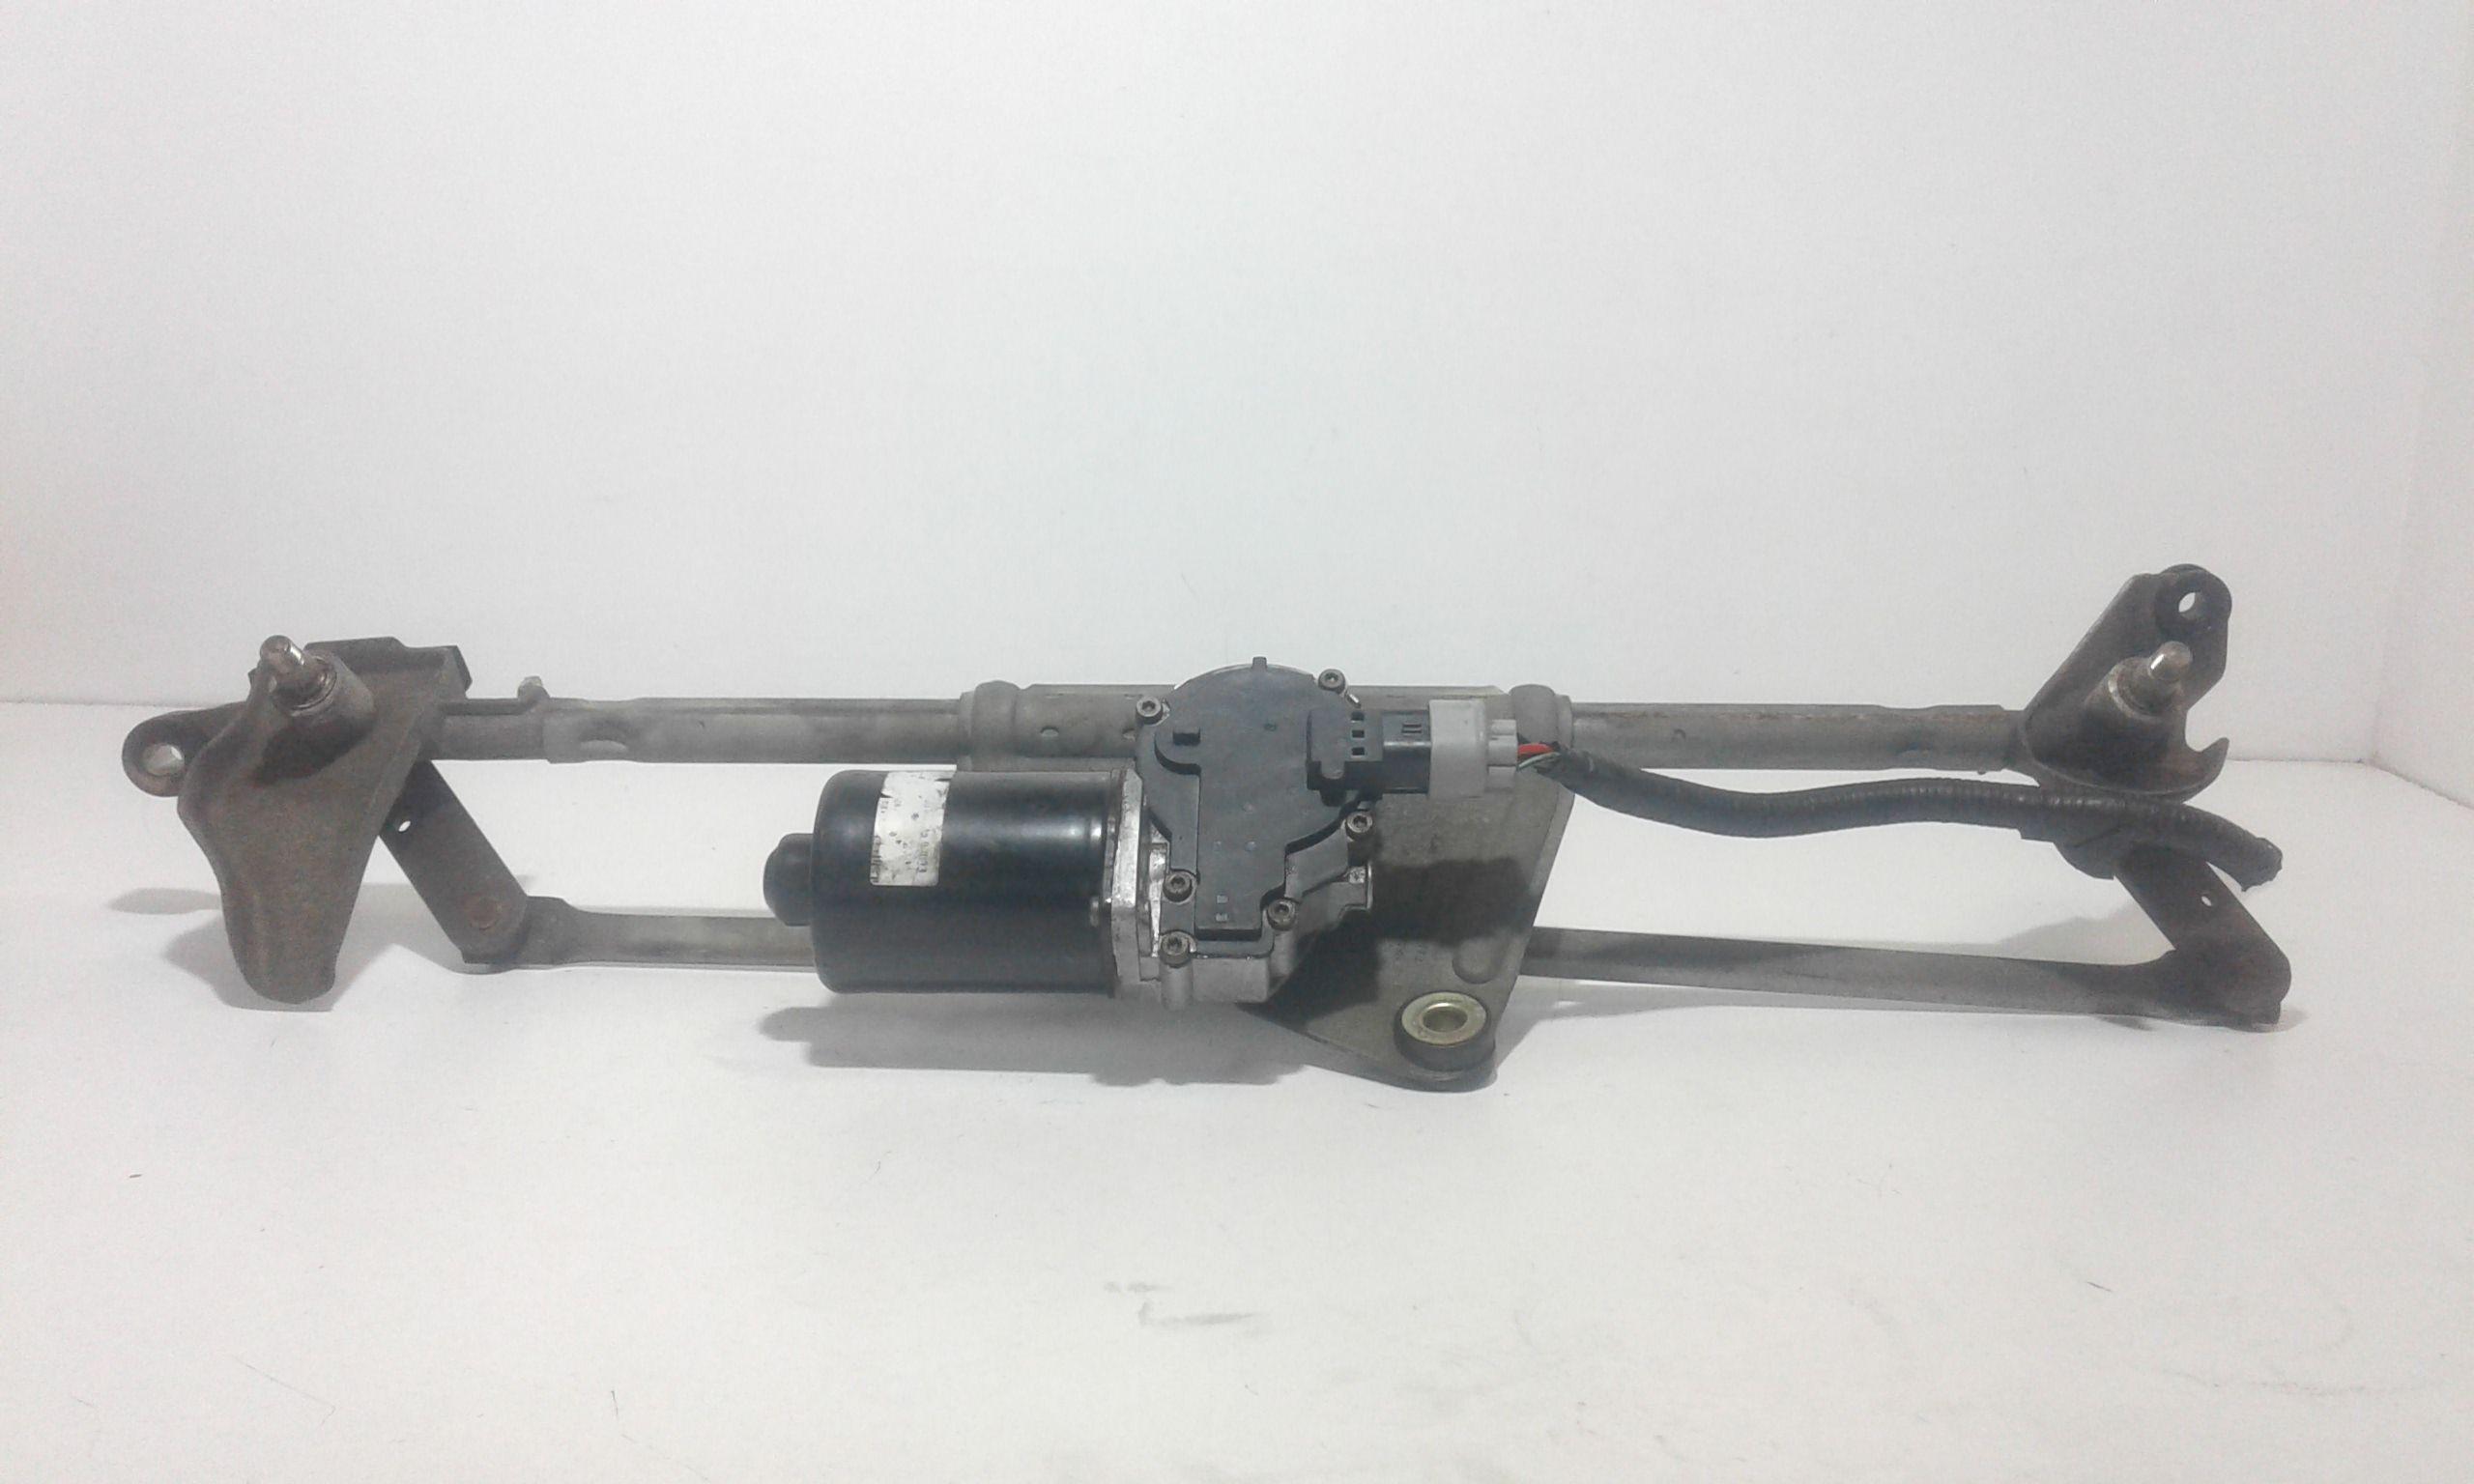 T11-5205011 MOTORINO TERGI ANT COMPLETO DI TANDEM DR 5 1° Serie 1600 Benzina    (2008) RICAMBI USATI